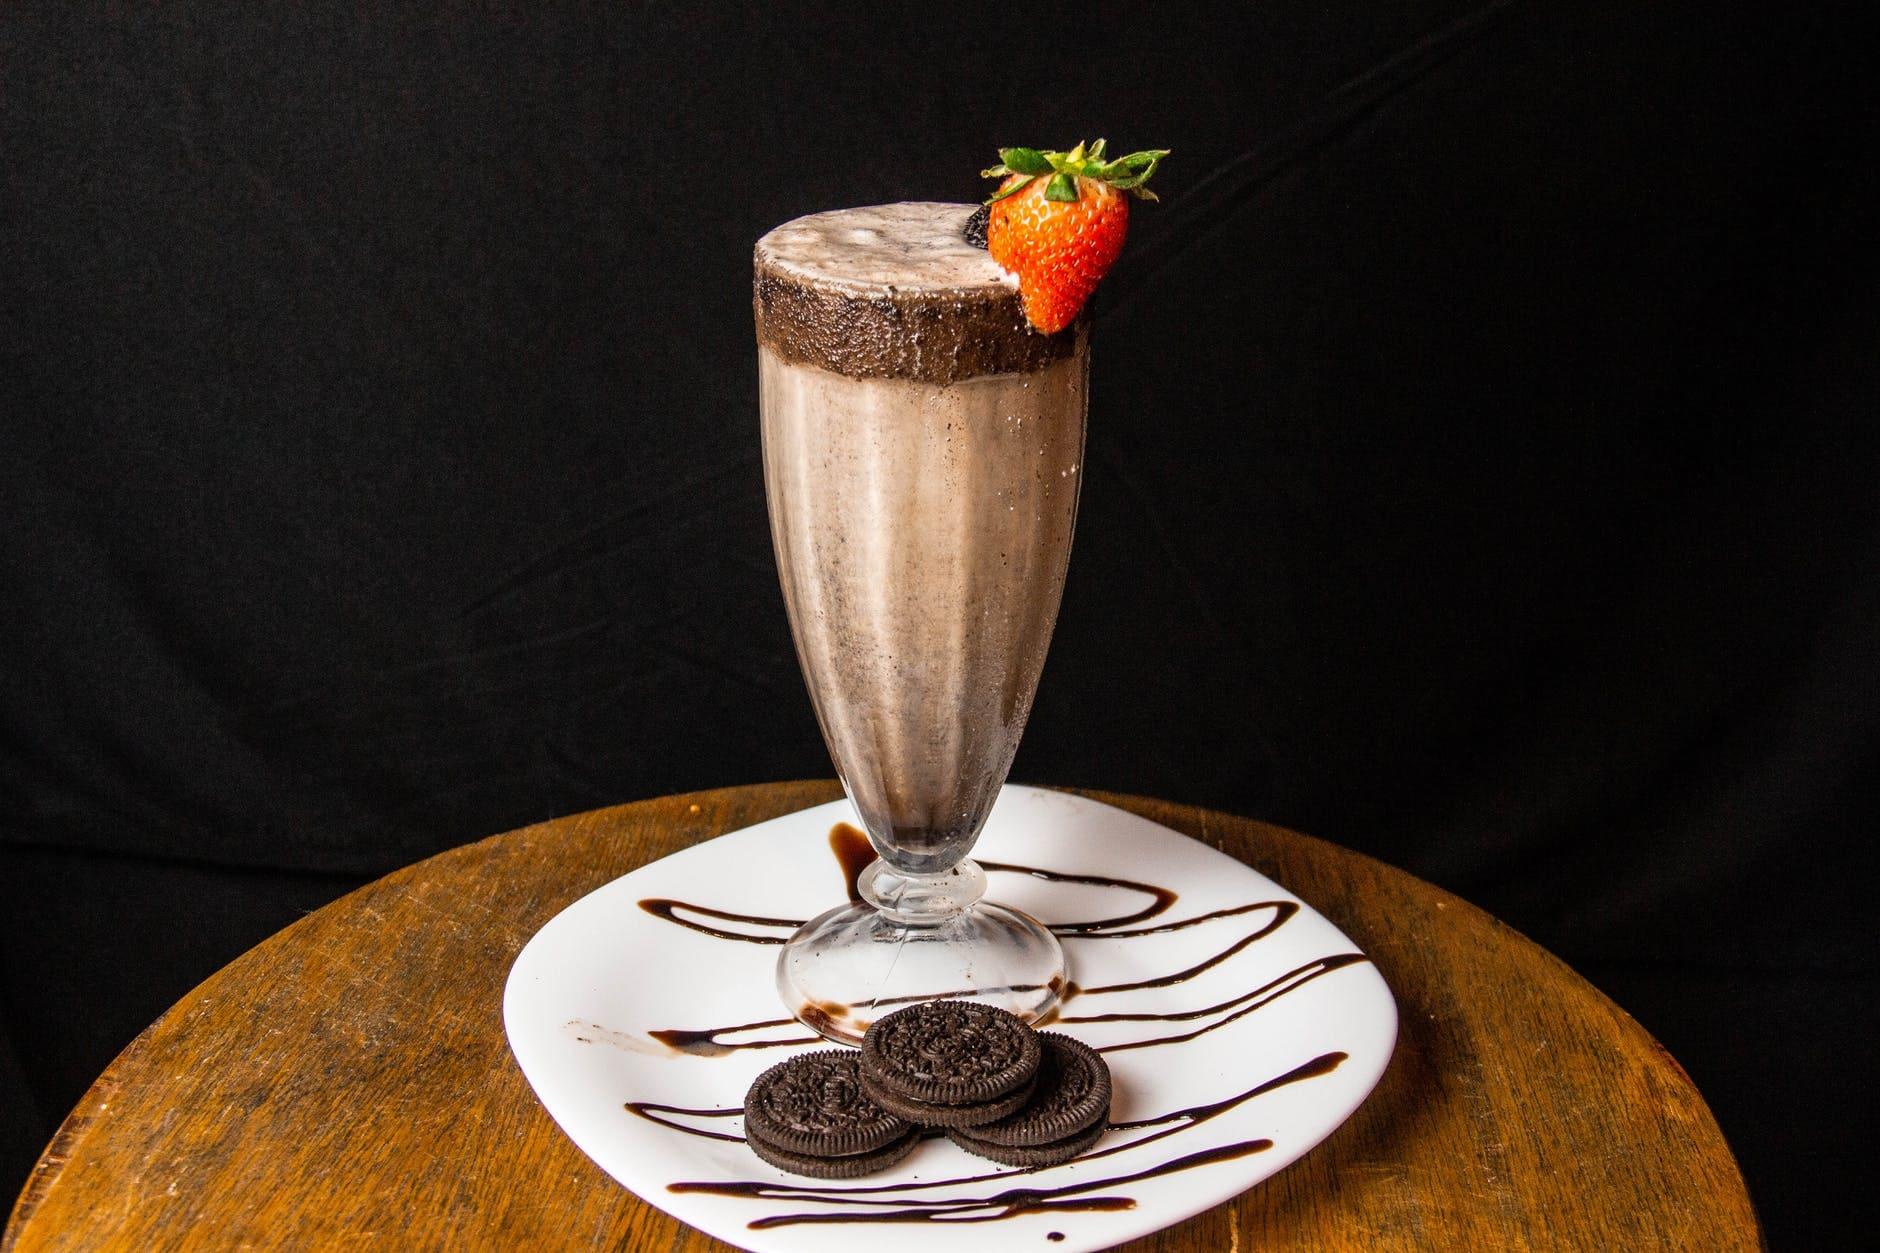 How to make a chocolate banana milkshake